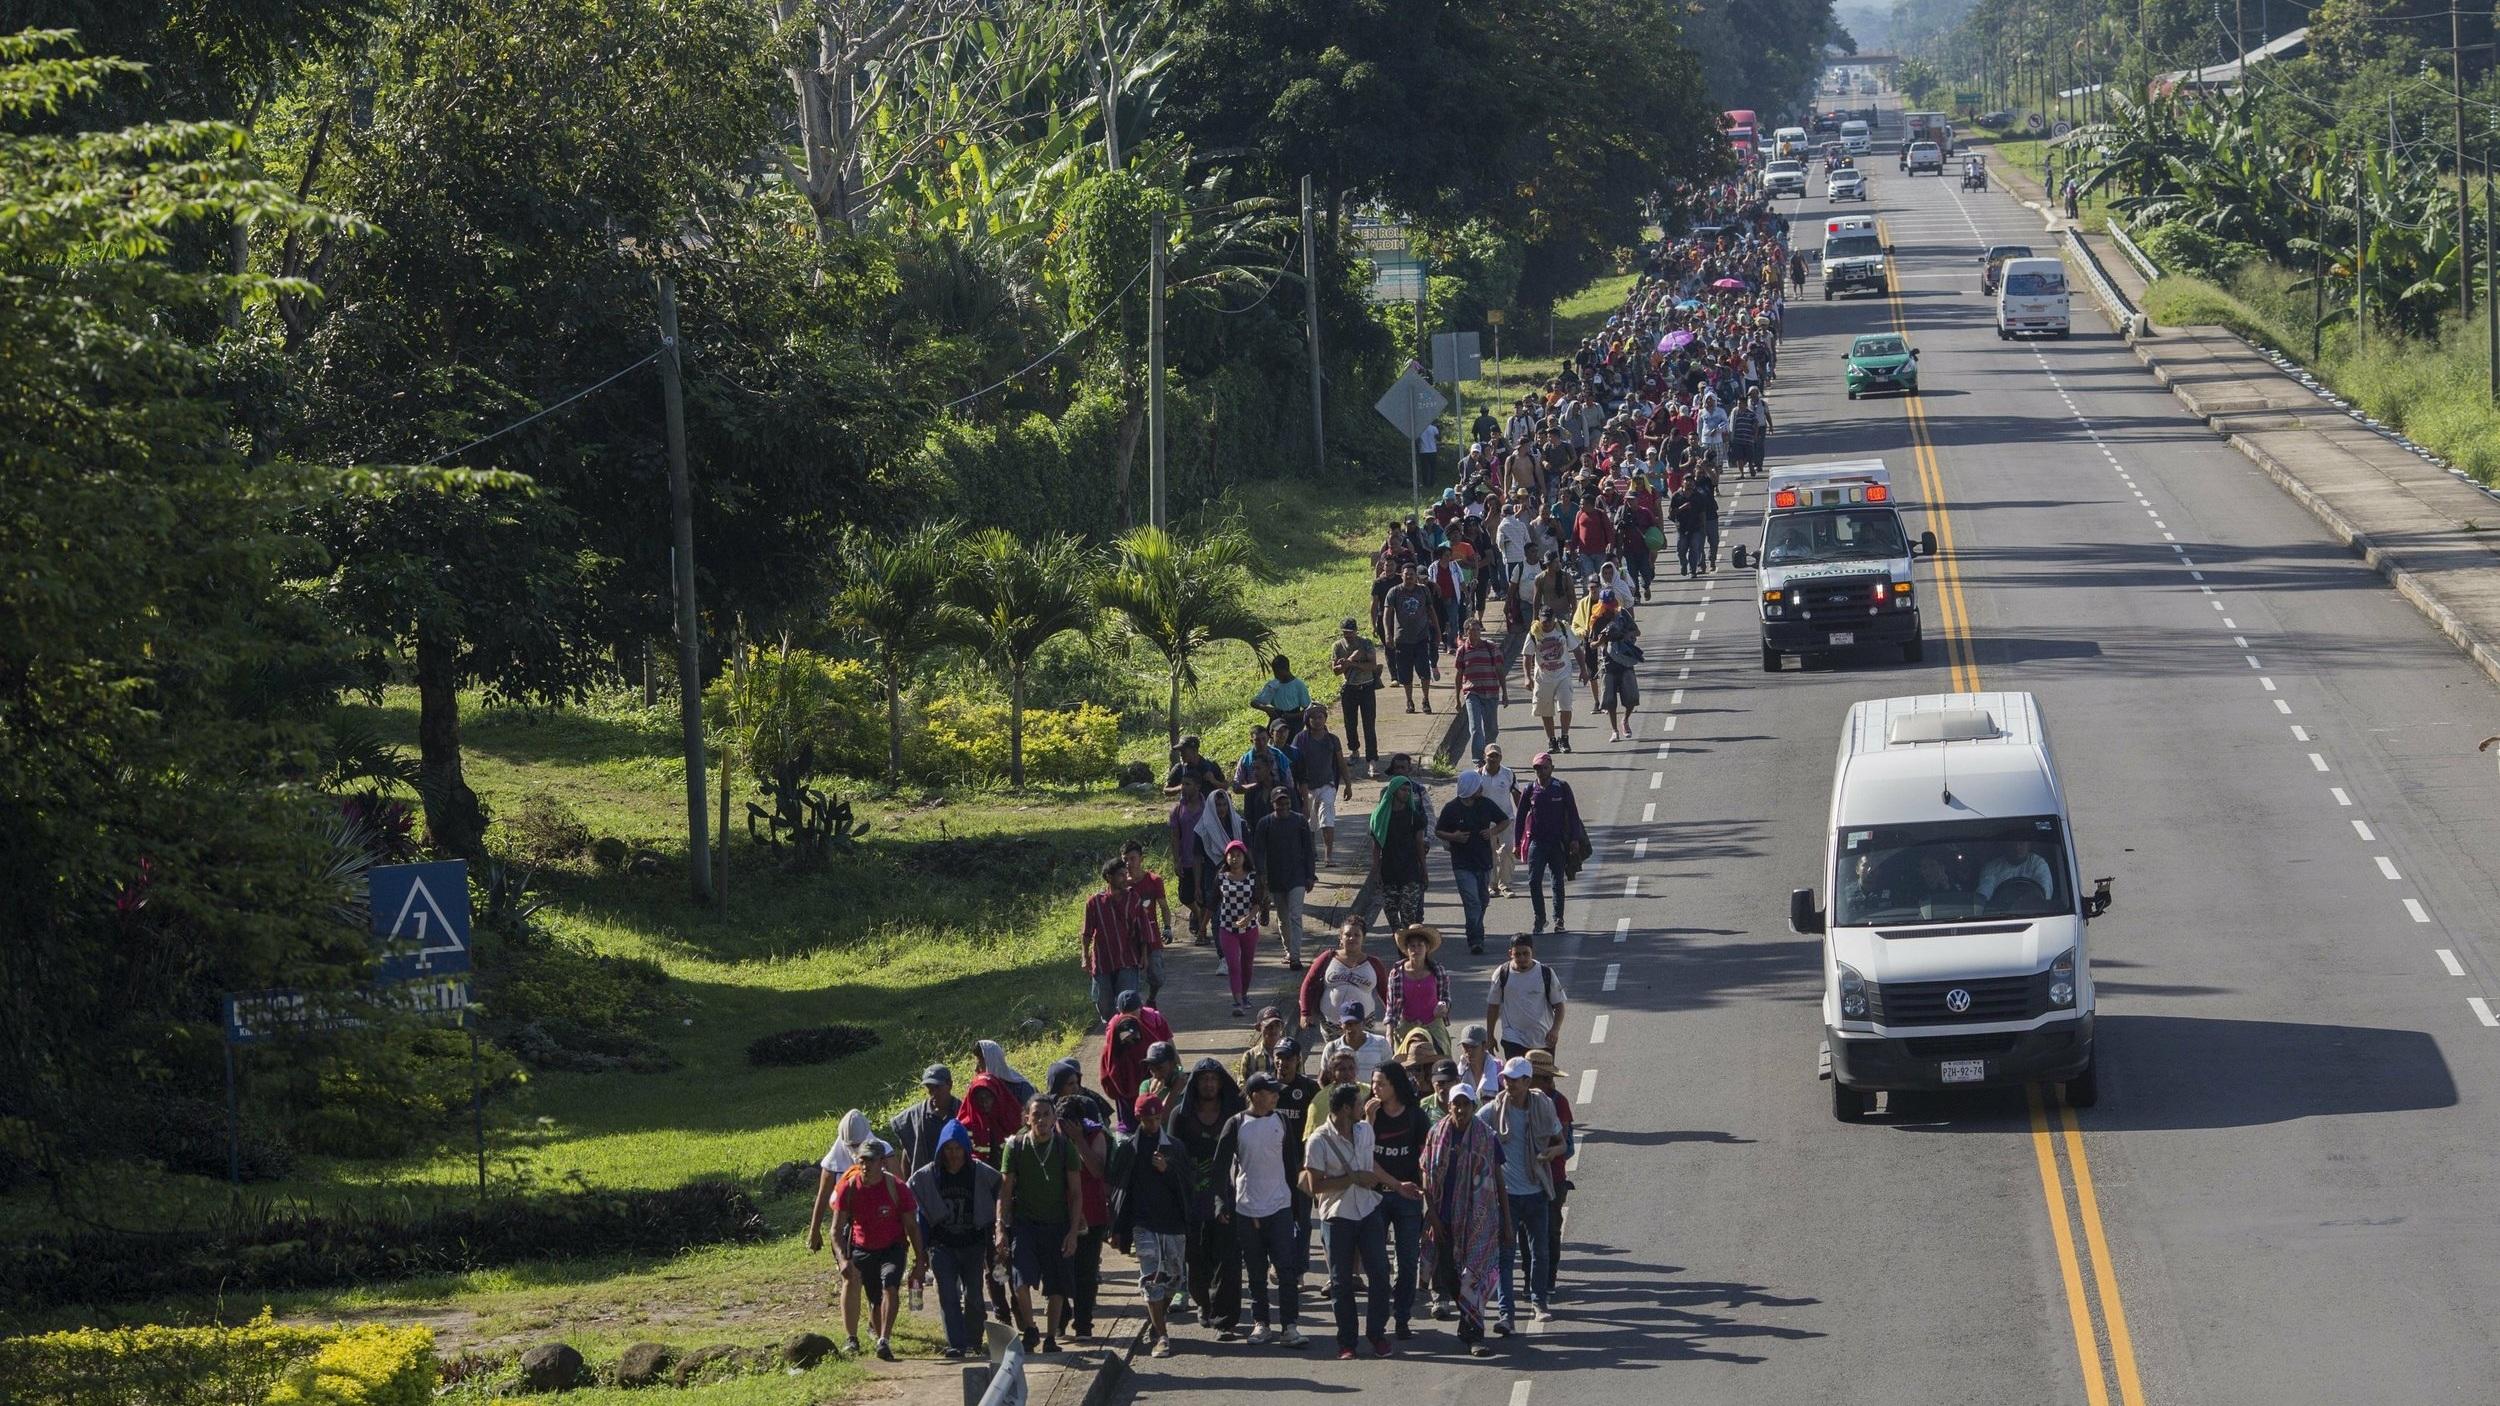 2018-10-30 - Honduran migrants walk to Tapachula from Ciudad Hidalgo